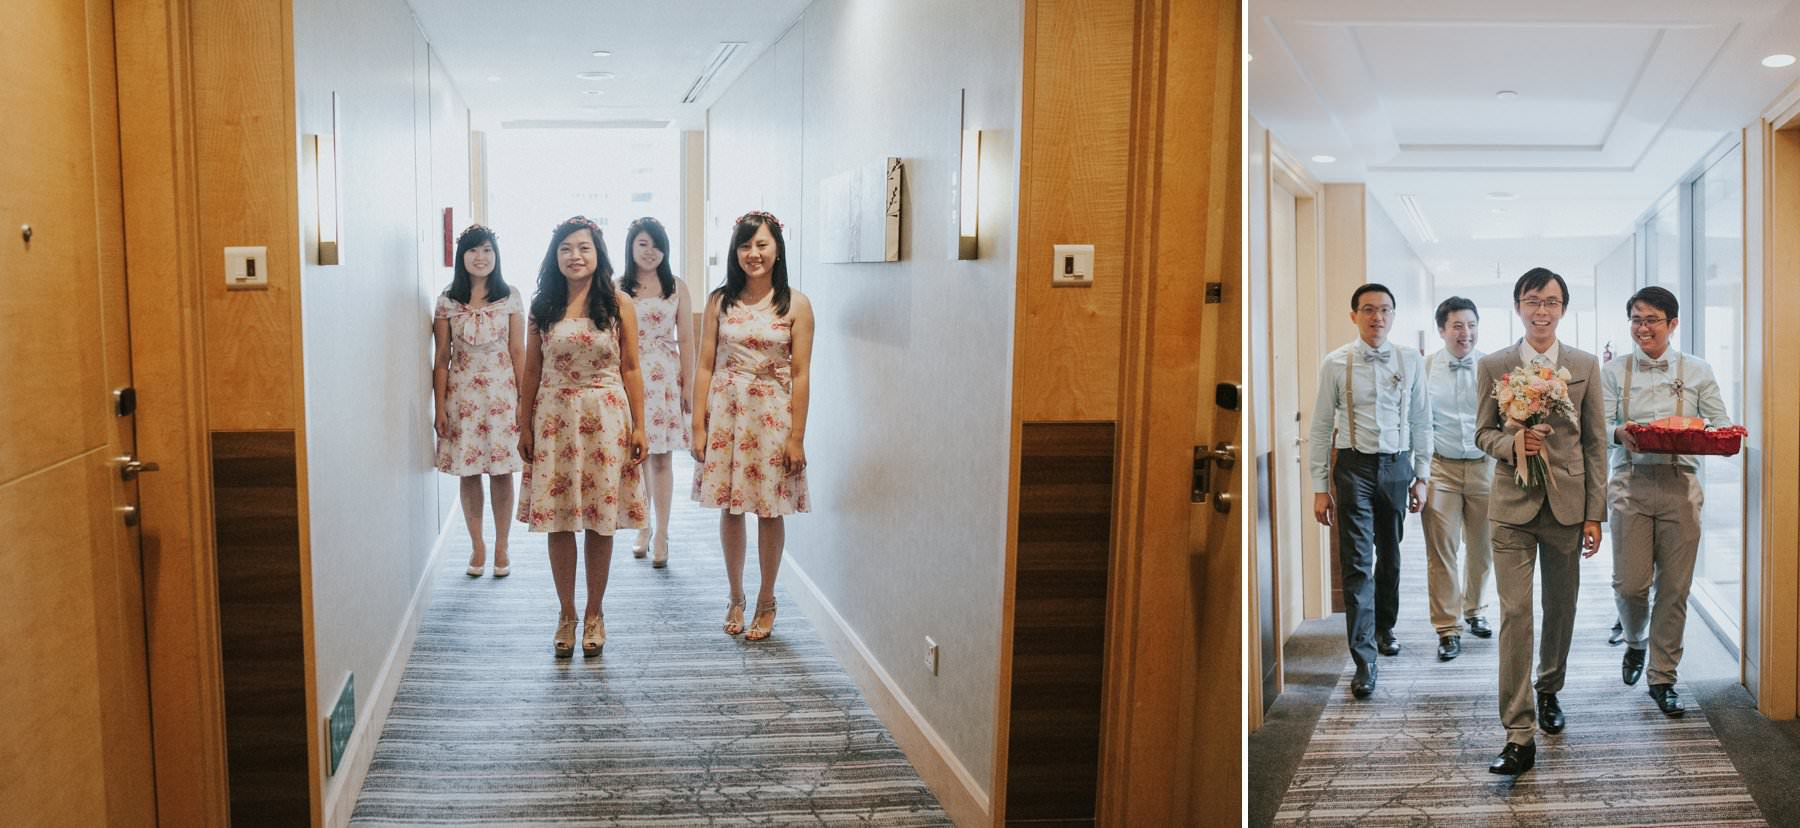 Singapore_Chijmes_Hall_Wedding_0019